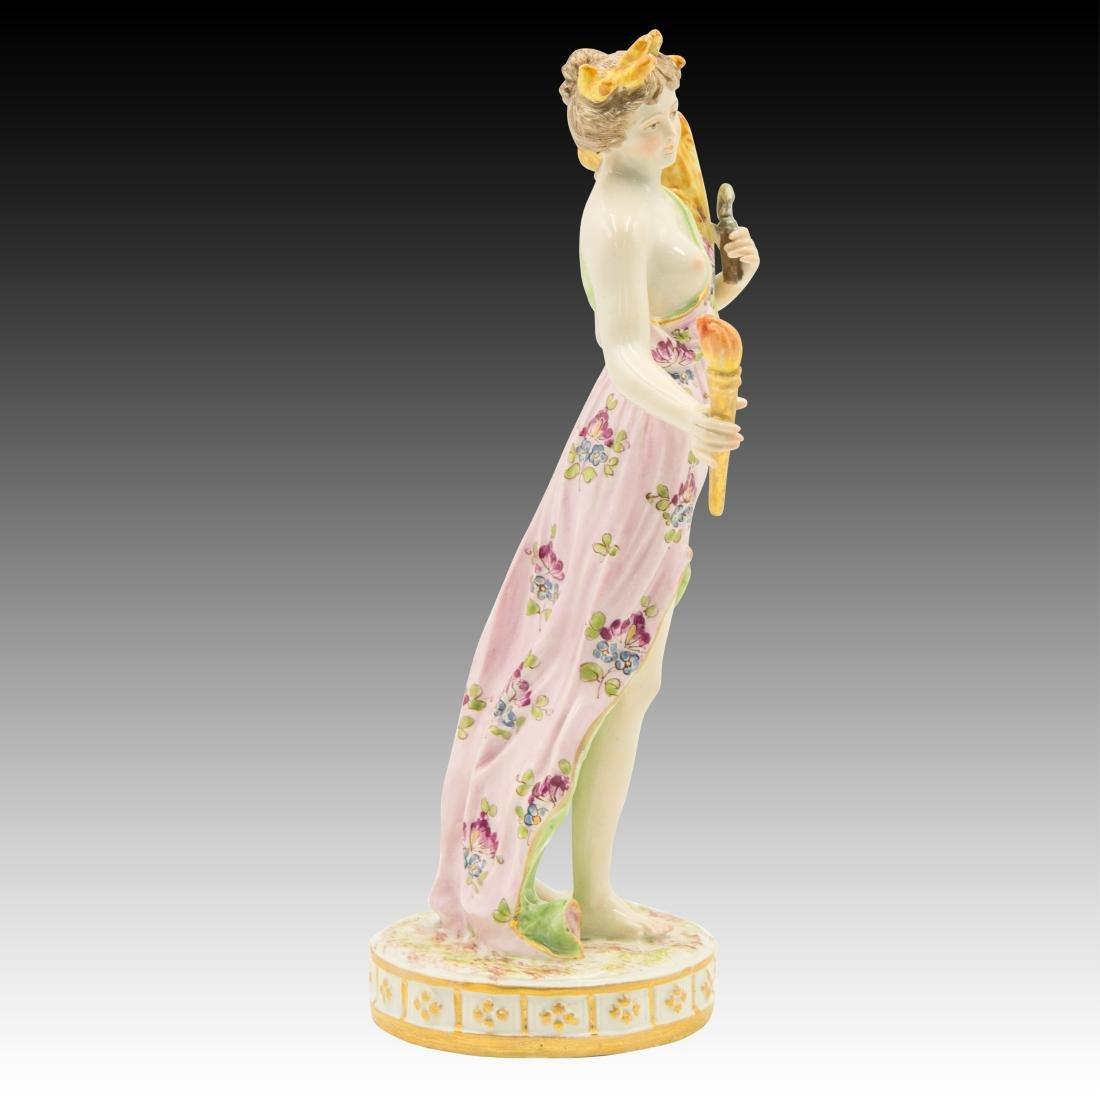 Meissen semi-nude Woman With Wheat Figurine - 4